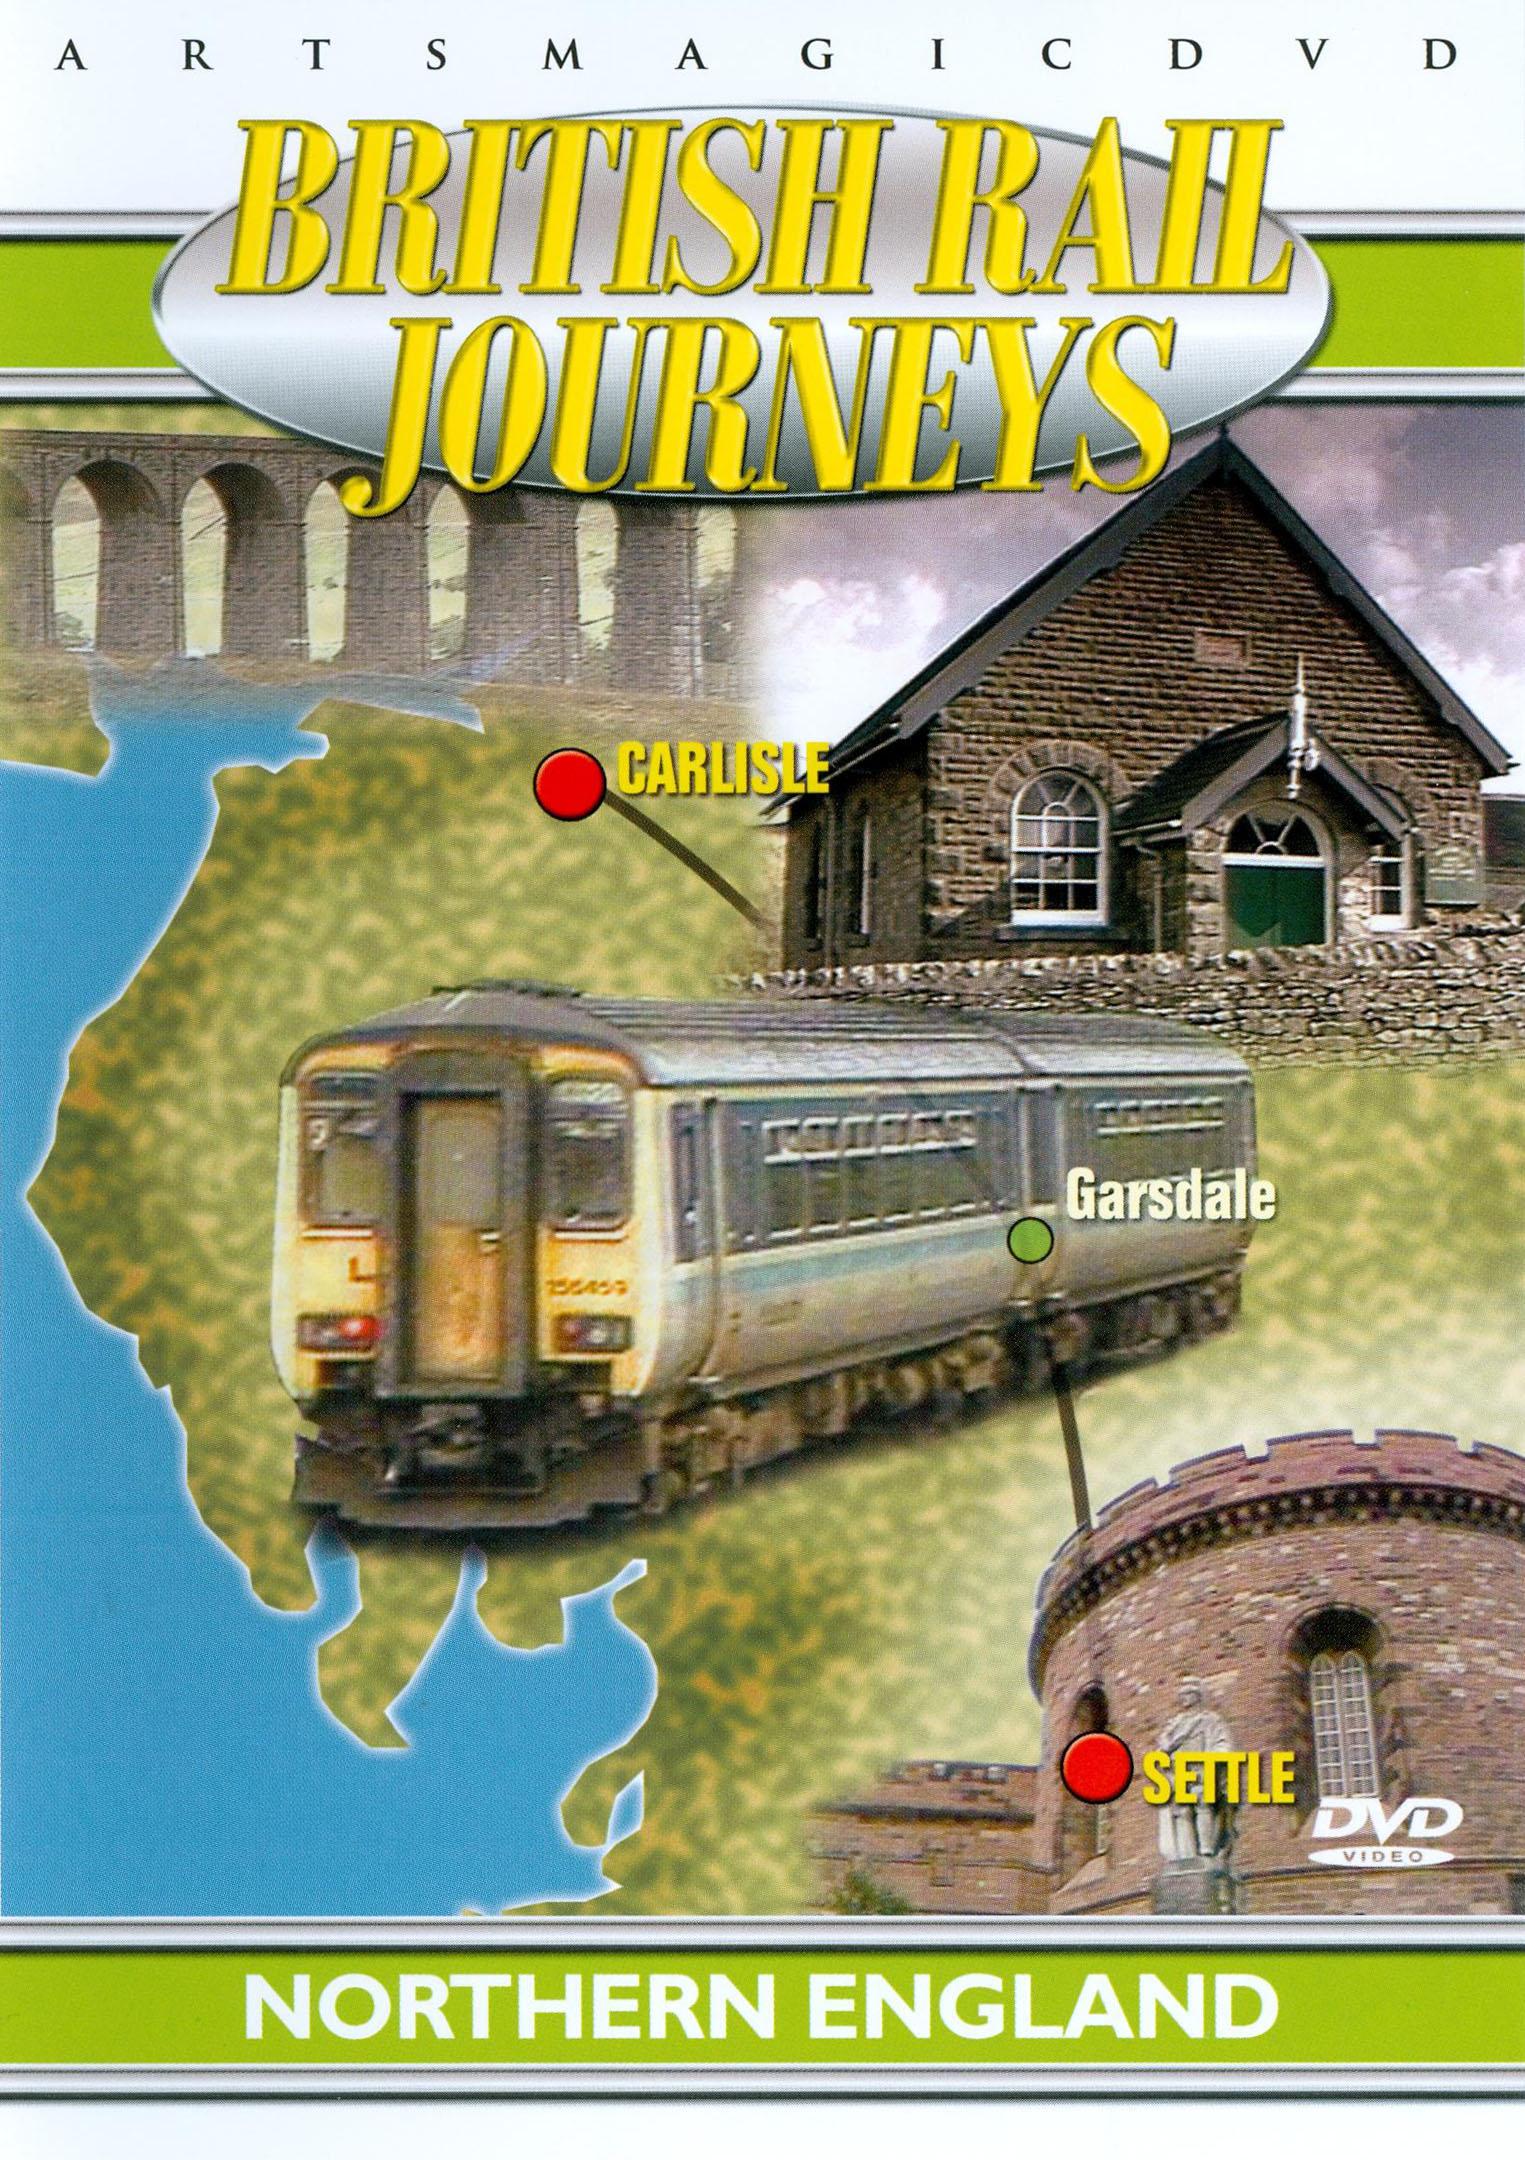 British Rail Journeys I: Northern England - Settle to ...